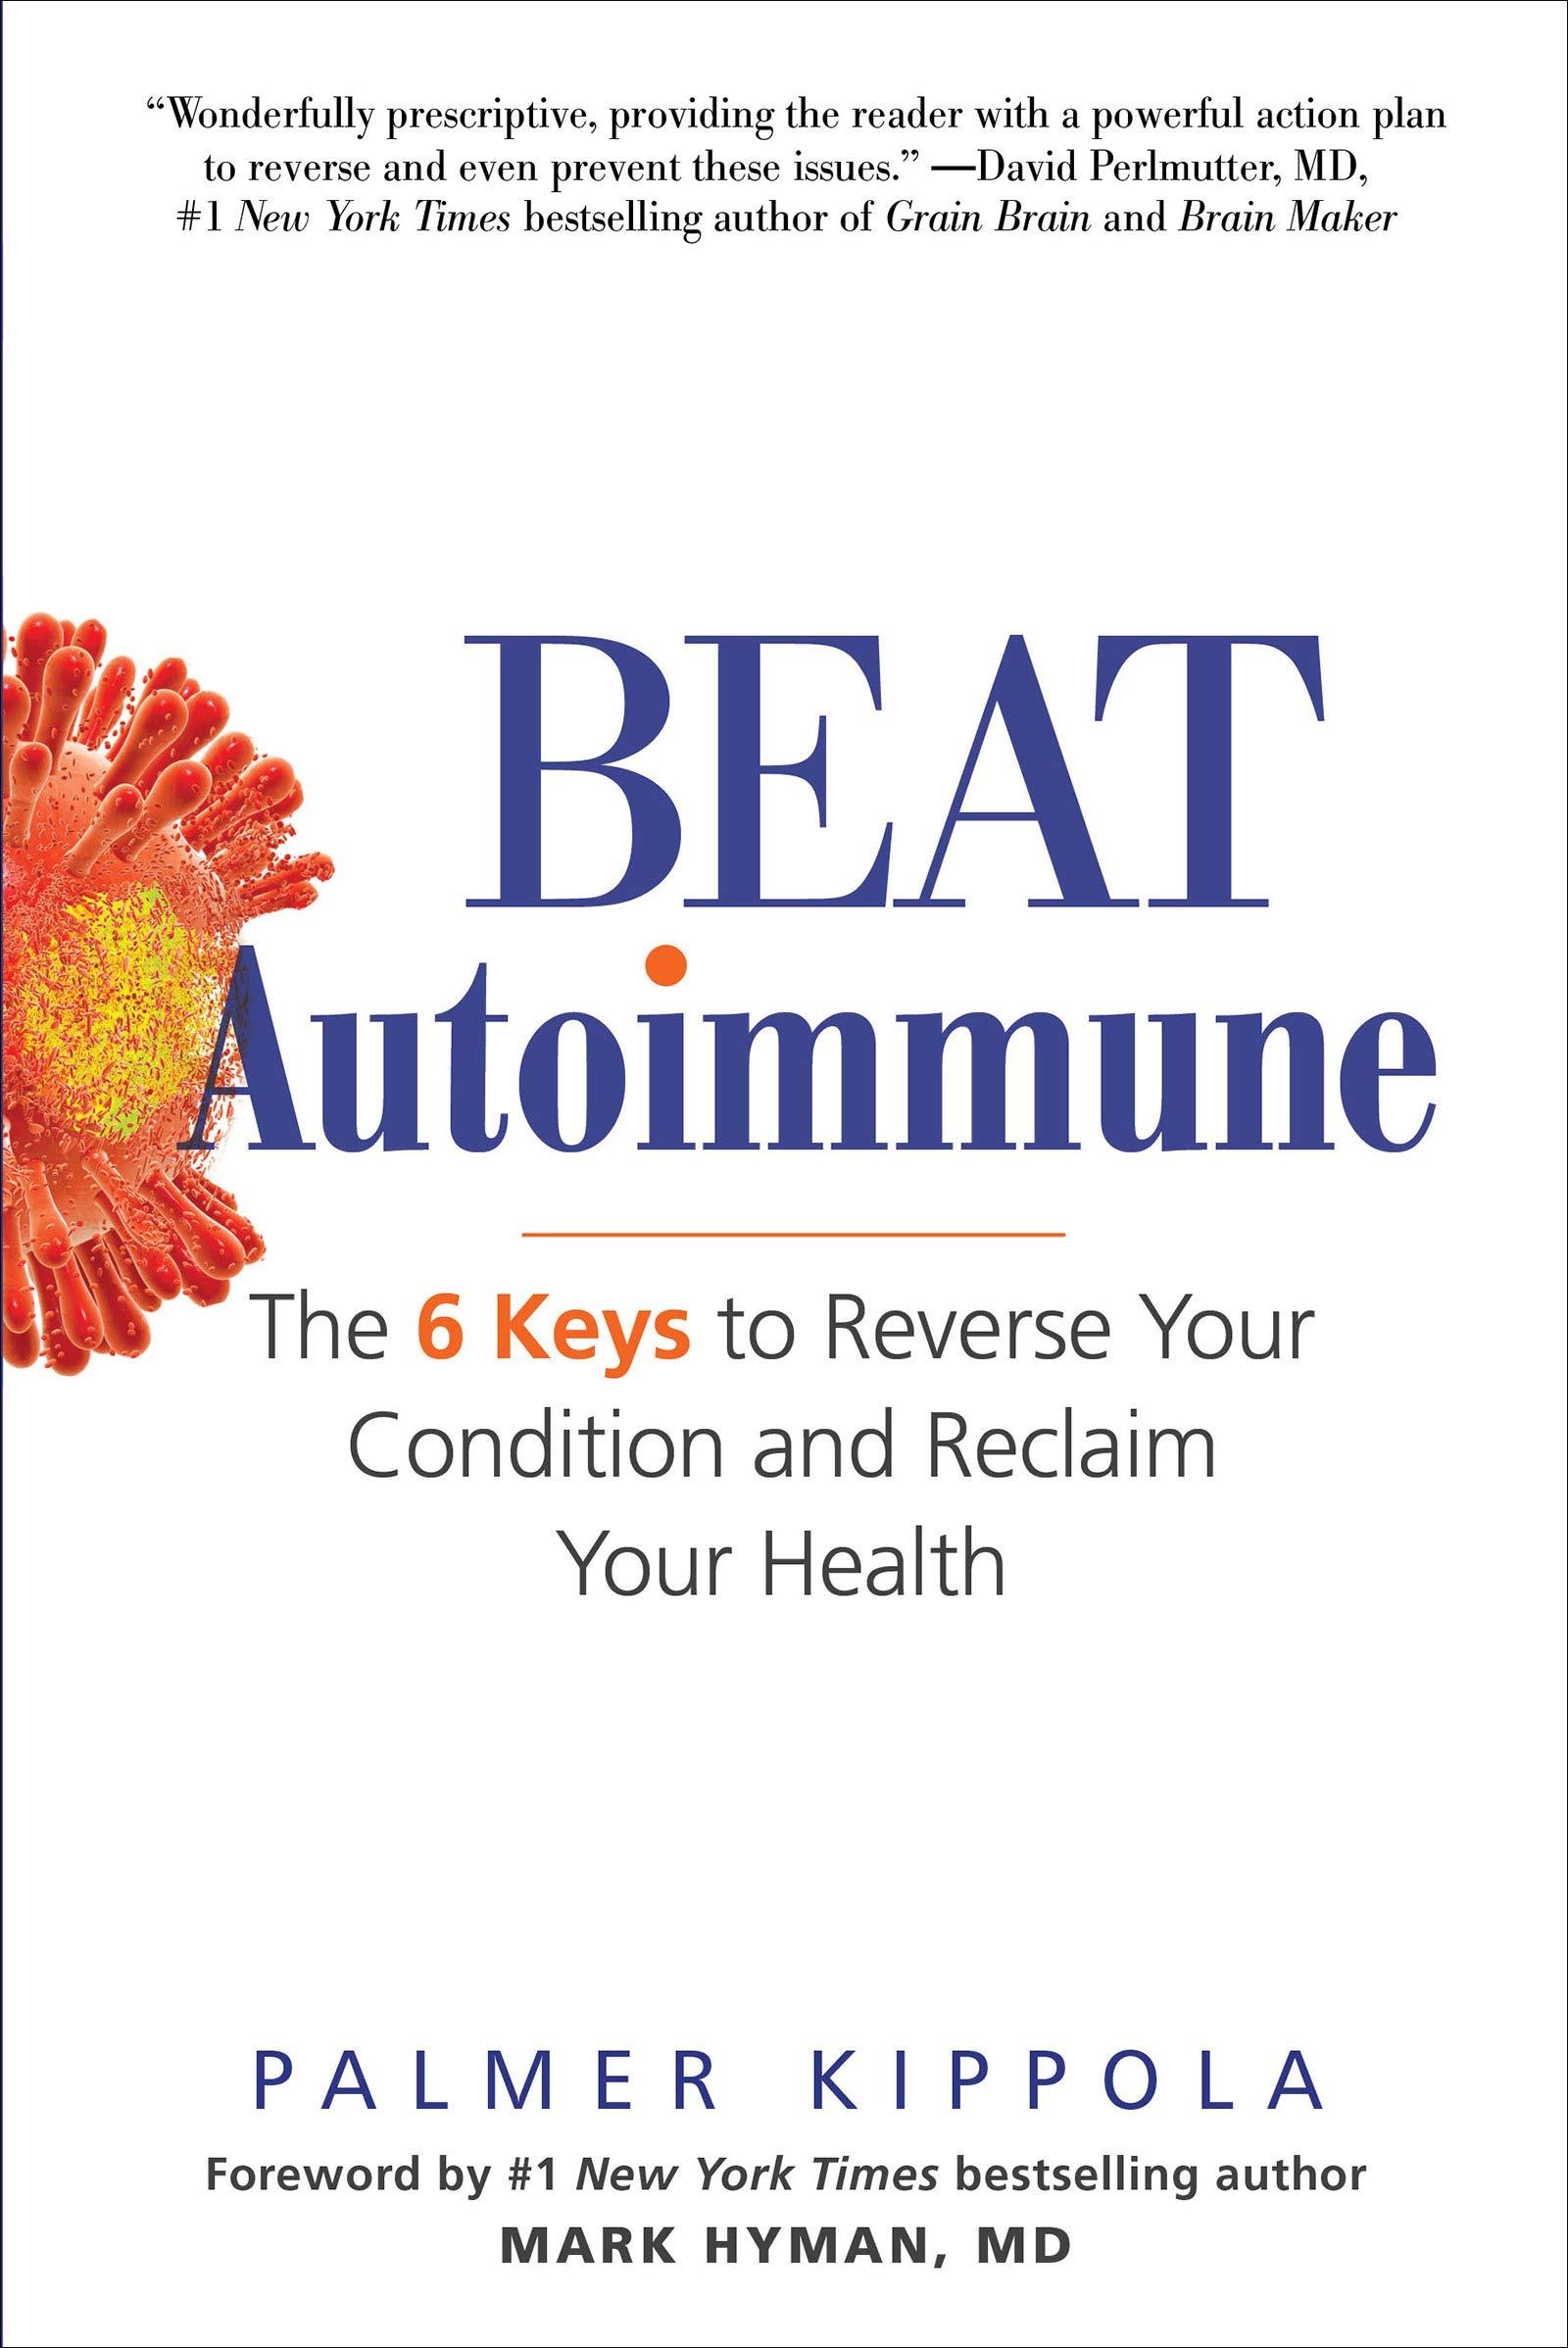 Beat Autoimmune: The 6 Keys to Reverse Your